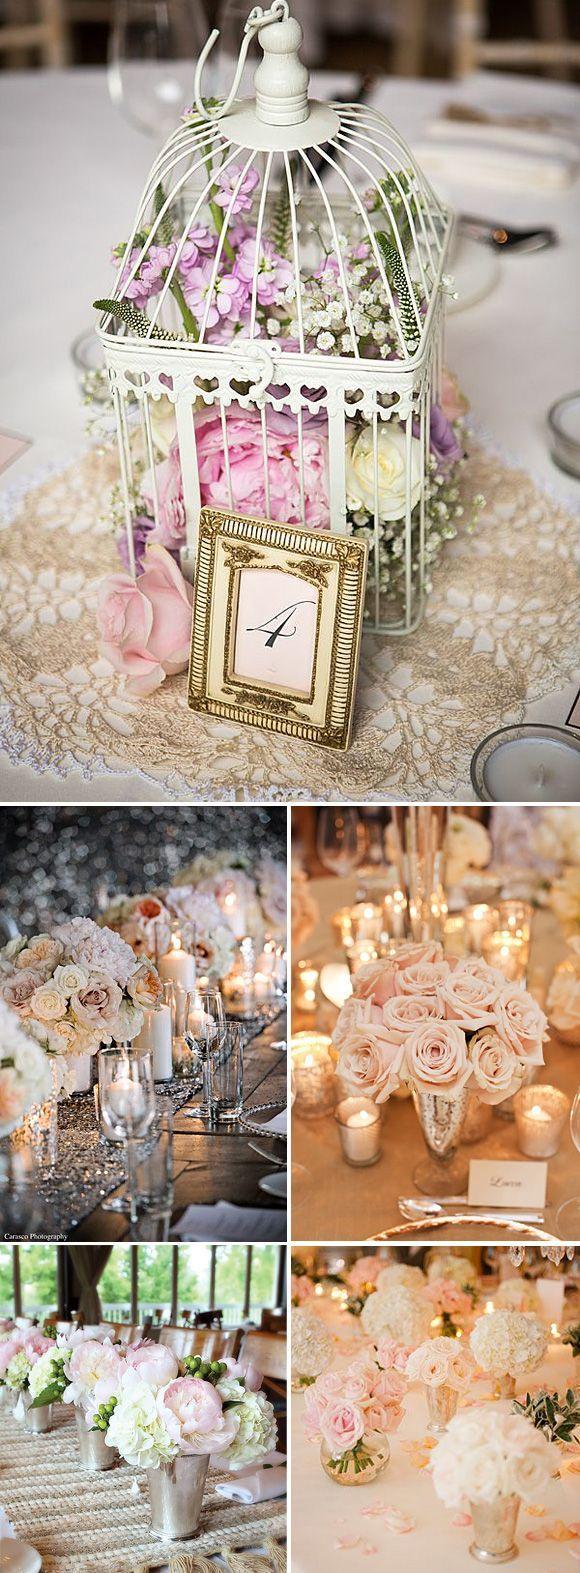 Boda m s rom ntica con numerosas ideas creativas bodas for Decoracion romantica vintage